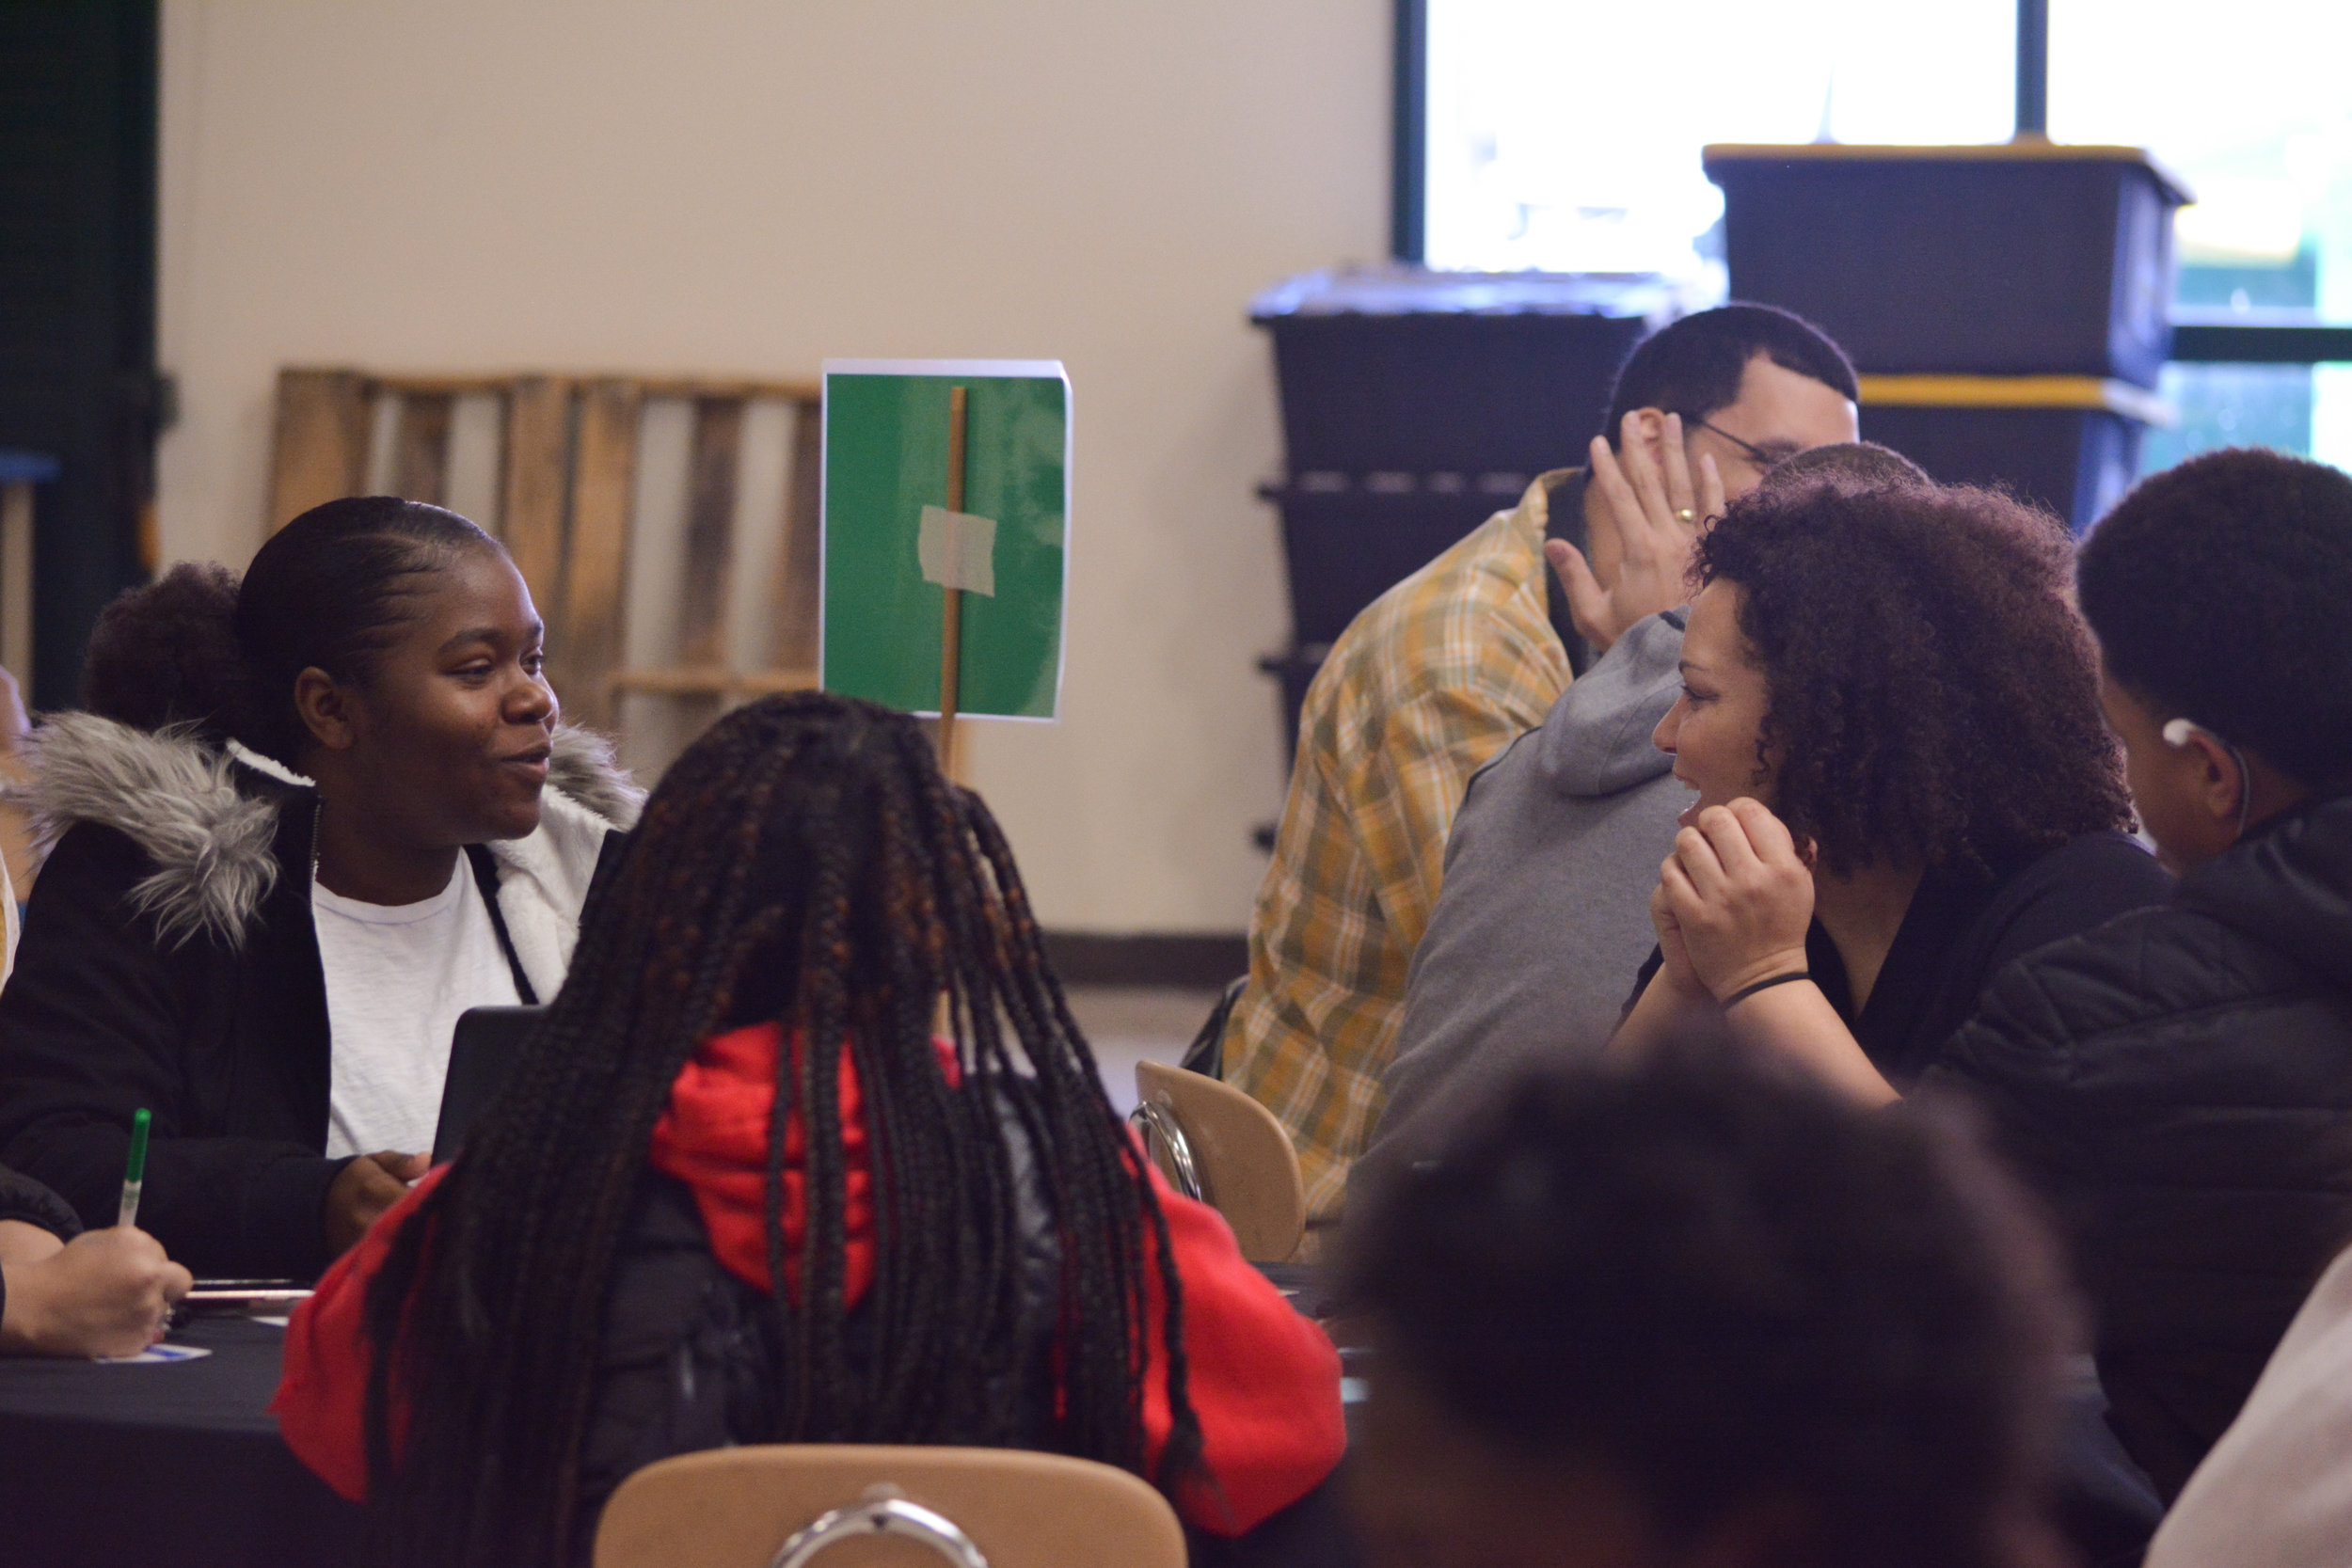 2019 Lunch & Learn at Reynold's High School